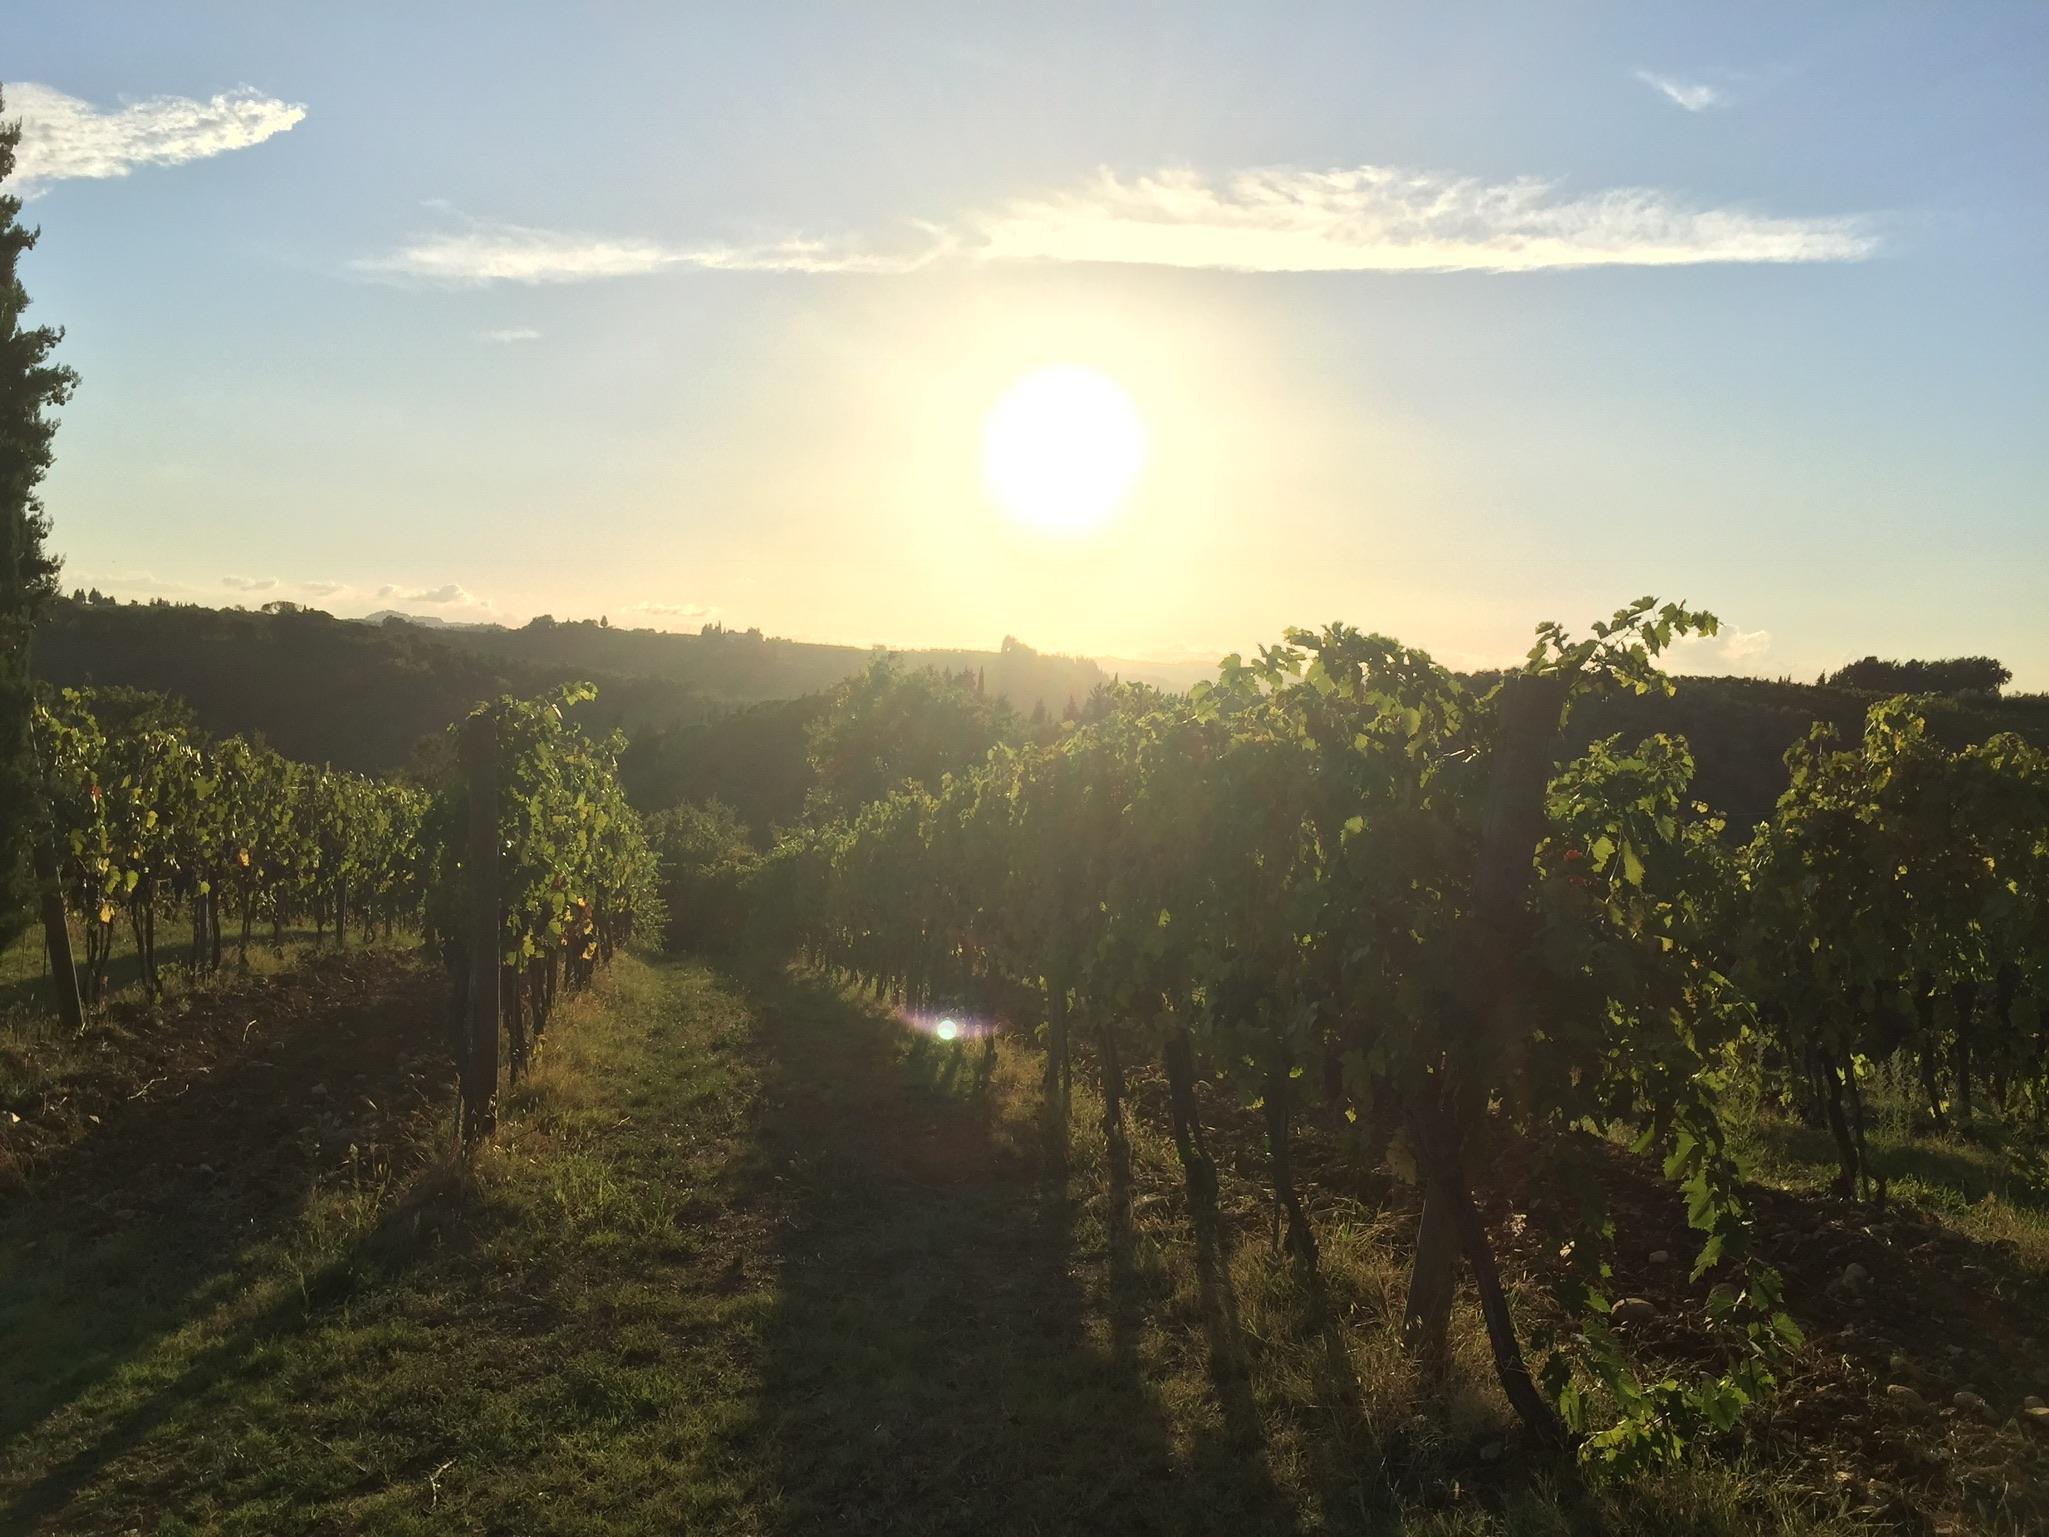 Tuscany vineyards grapes and olives sunset Chianti www.annakooiman.com anna kooiman